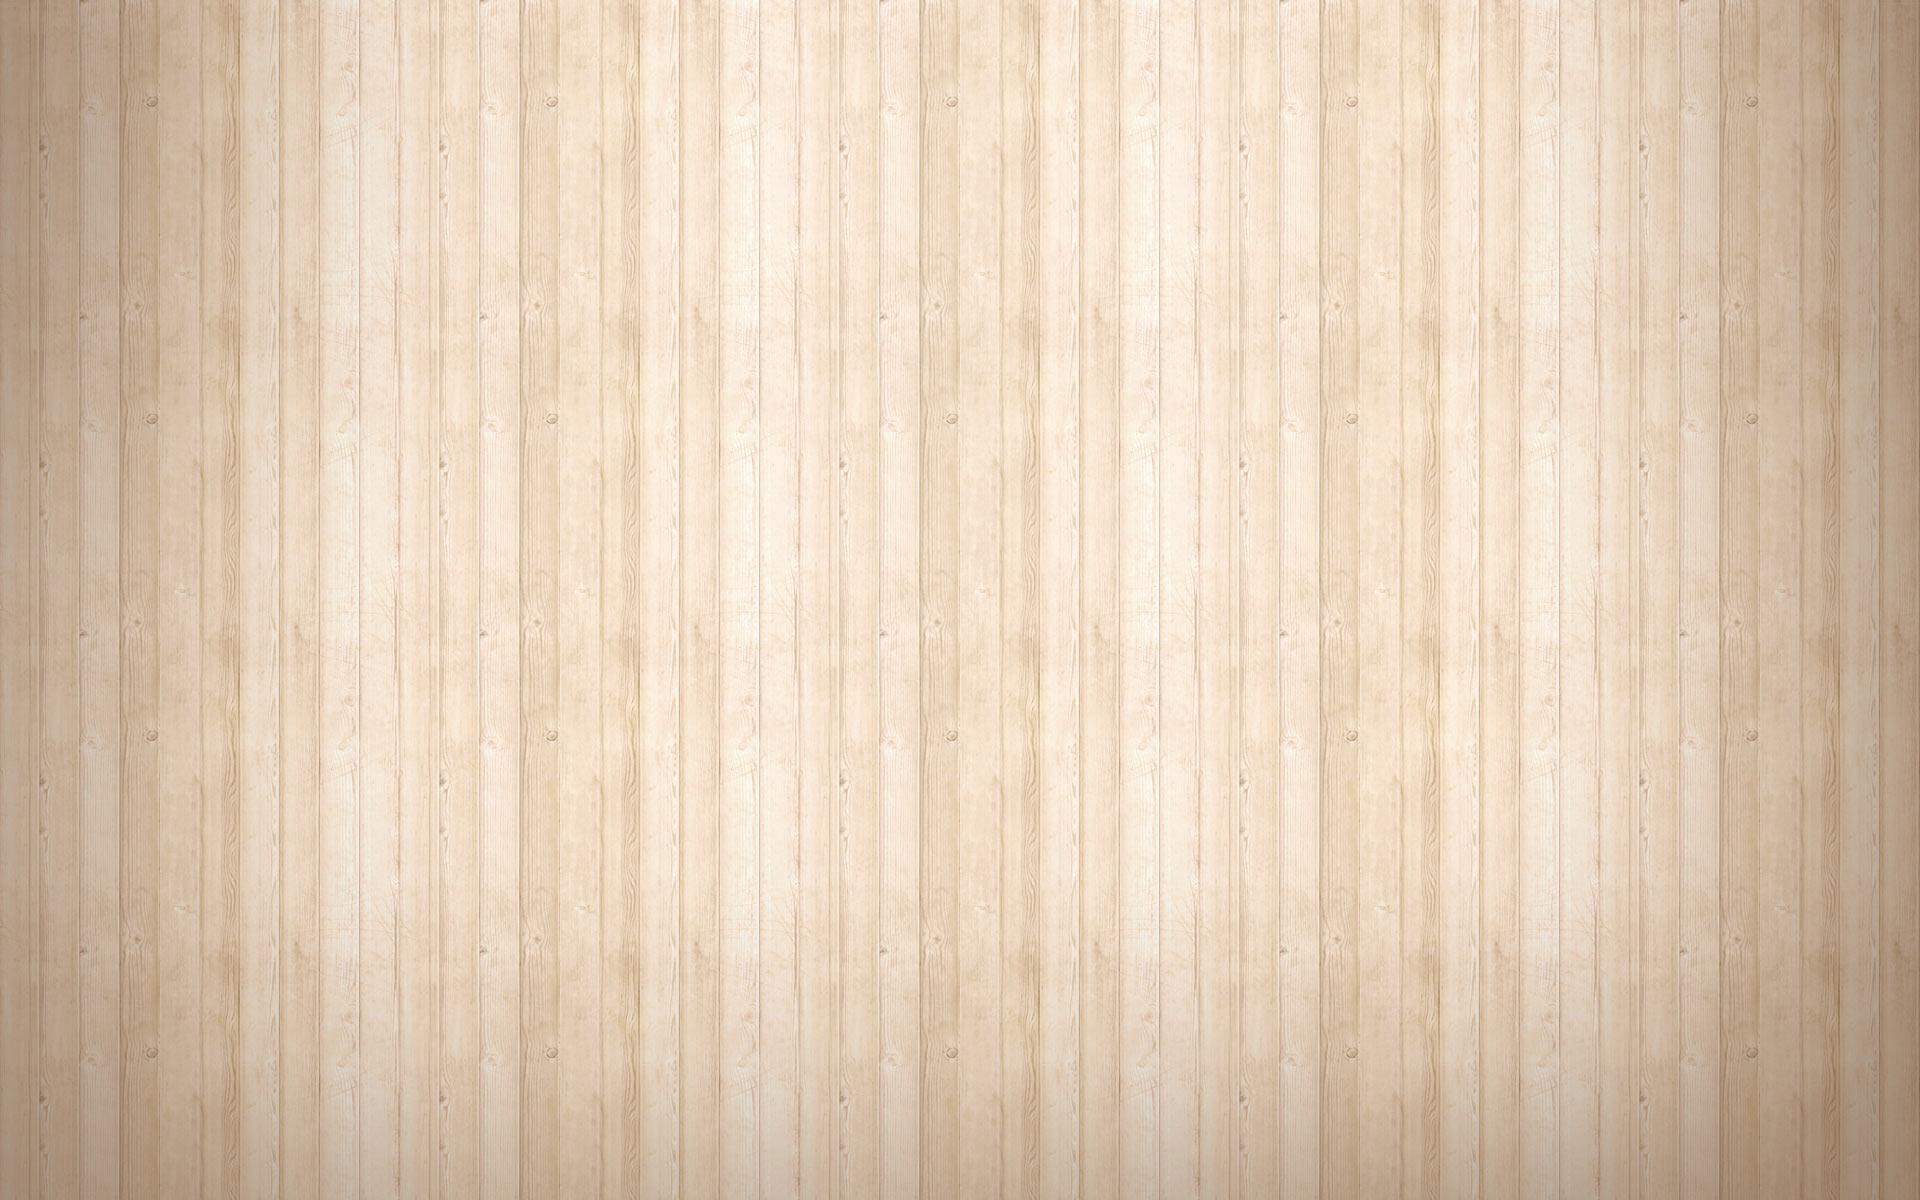 Simple Background Images For Websites